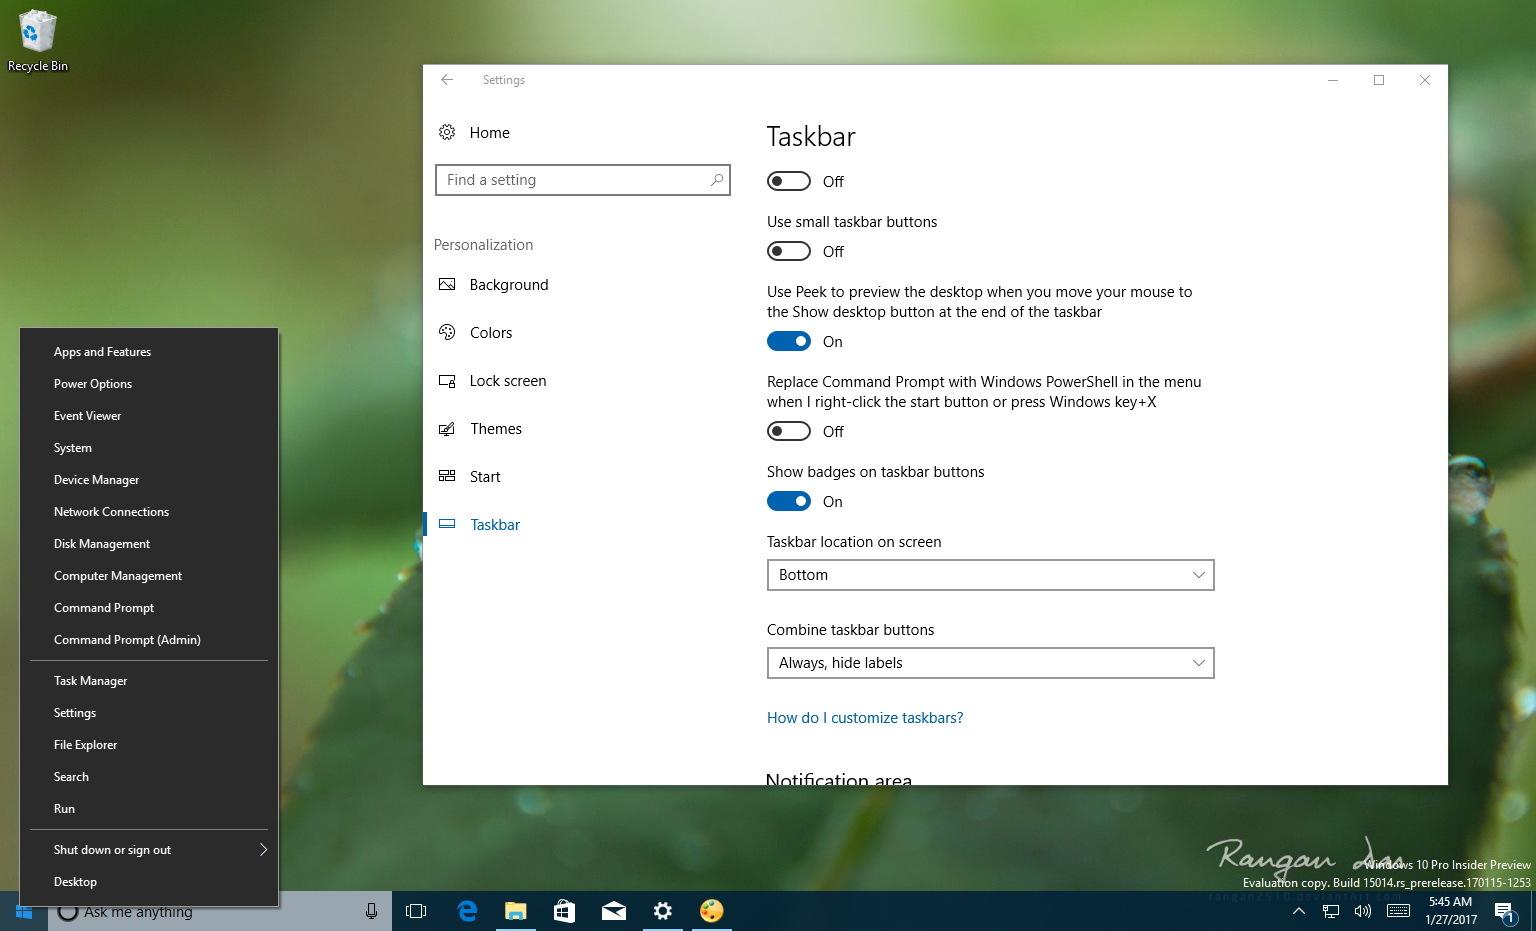 Command Prompt on Power User menu (Windows + X)